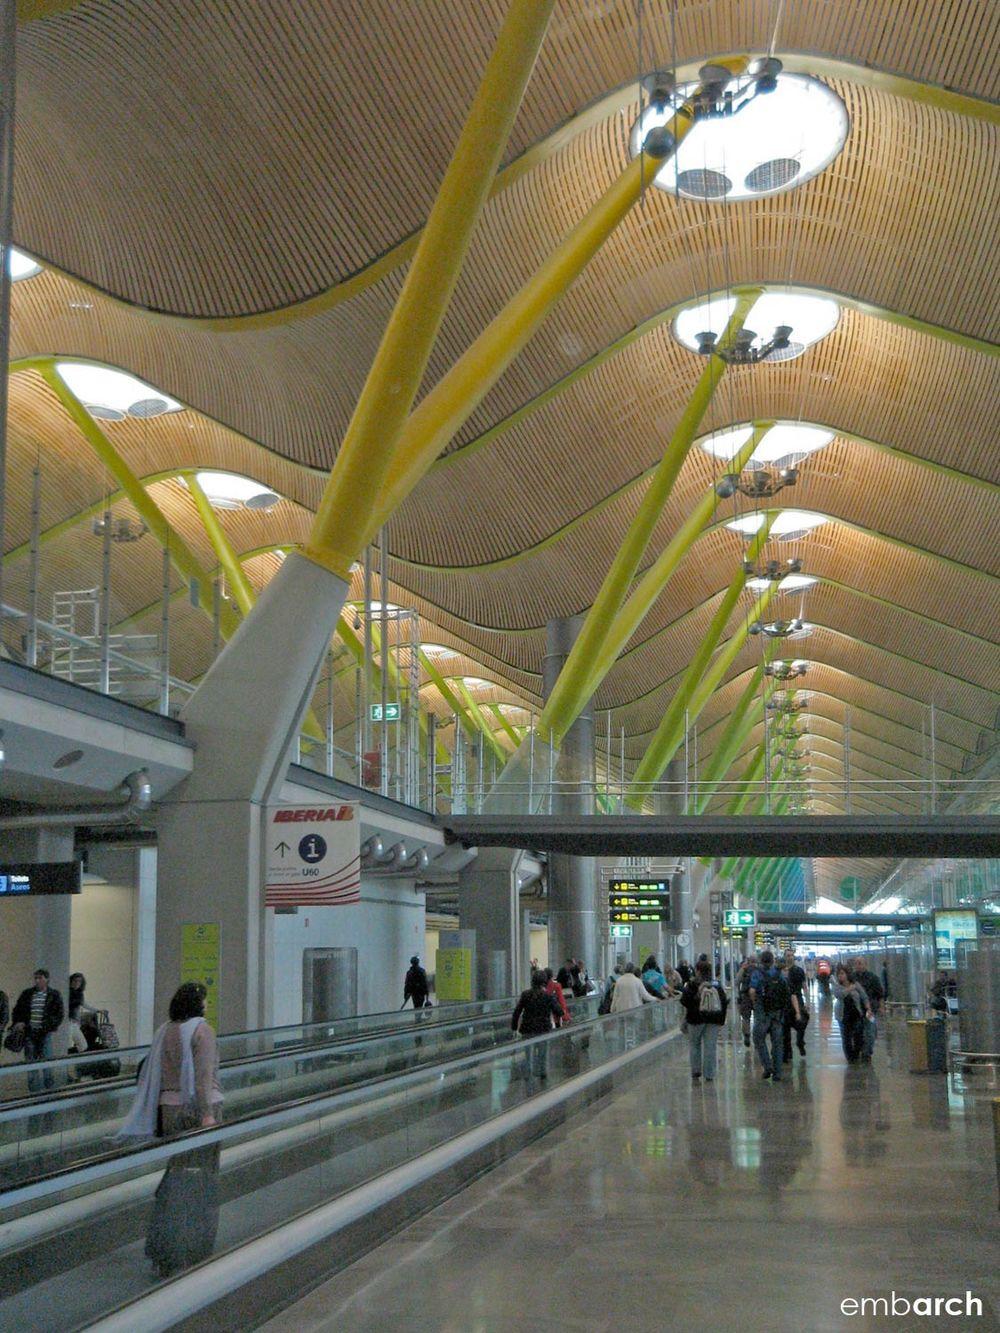 Madrid Madrid Barajas Airport Embarch